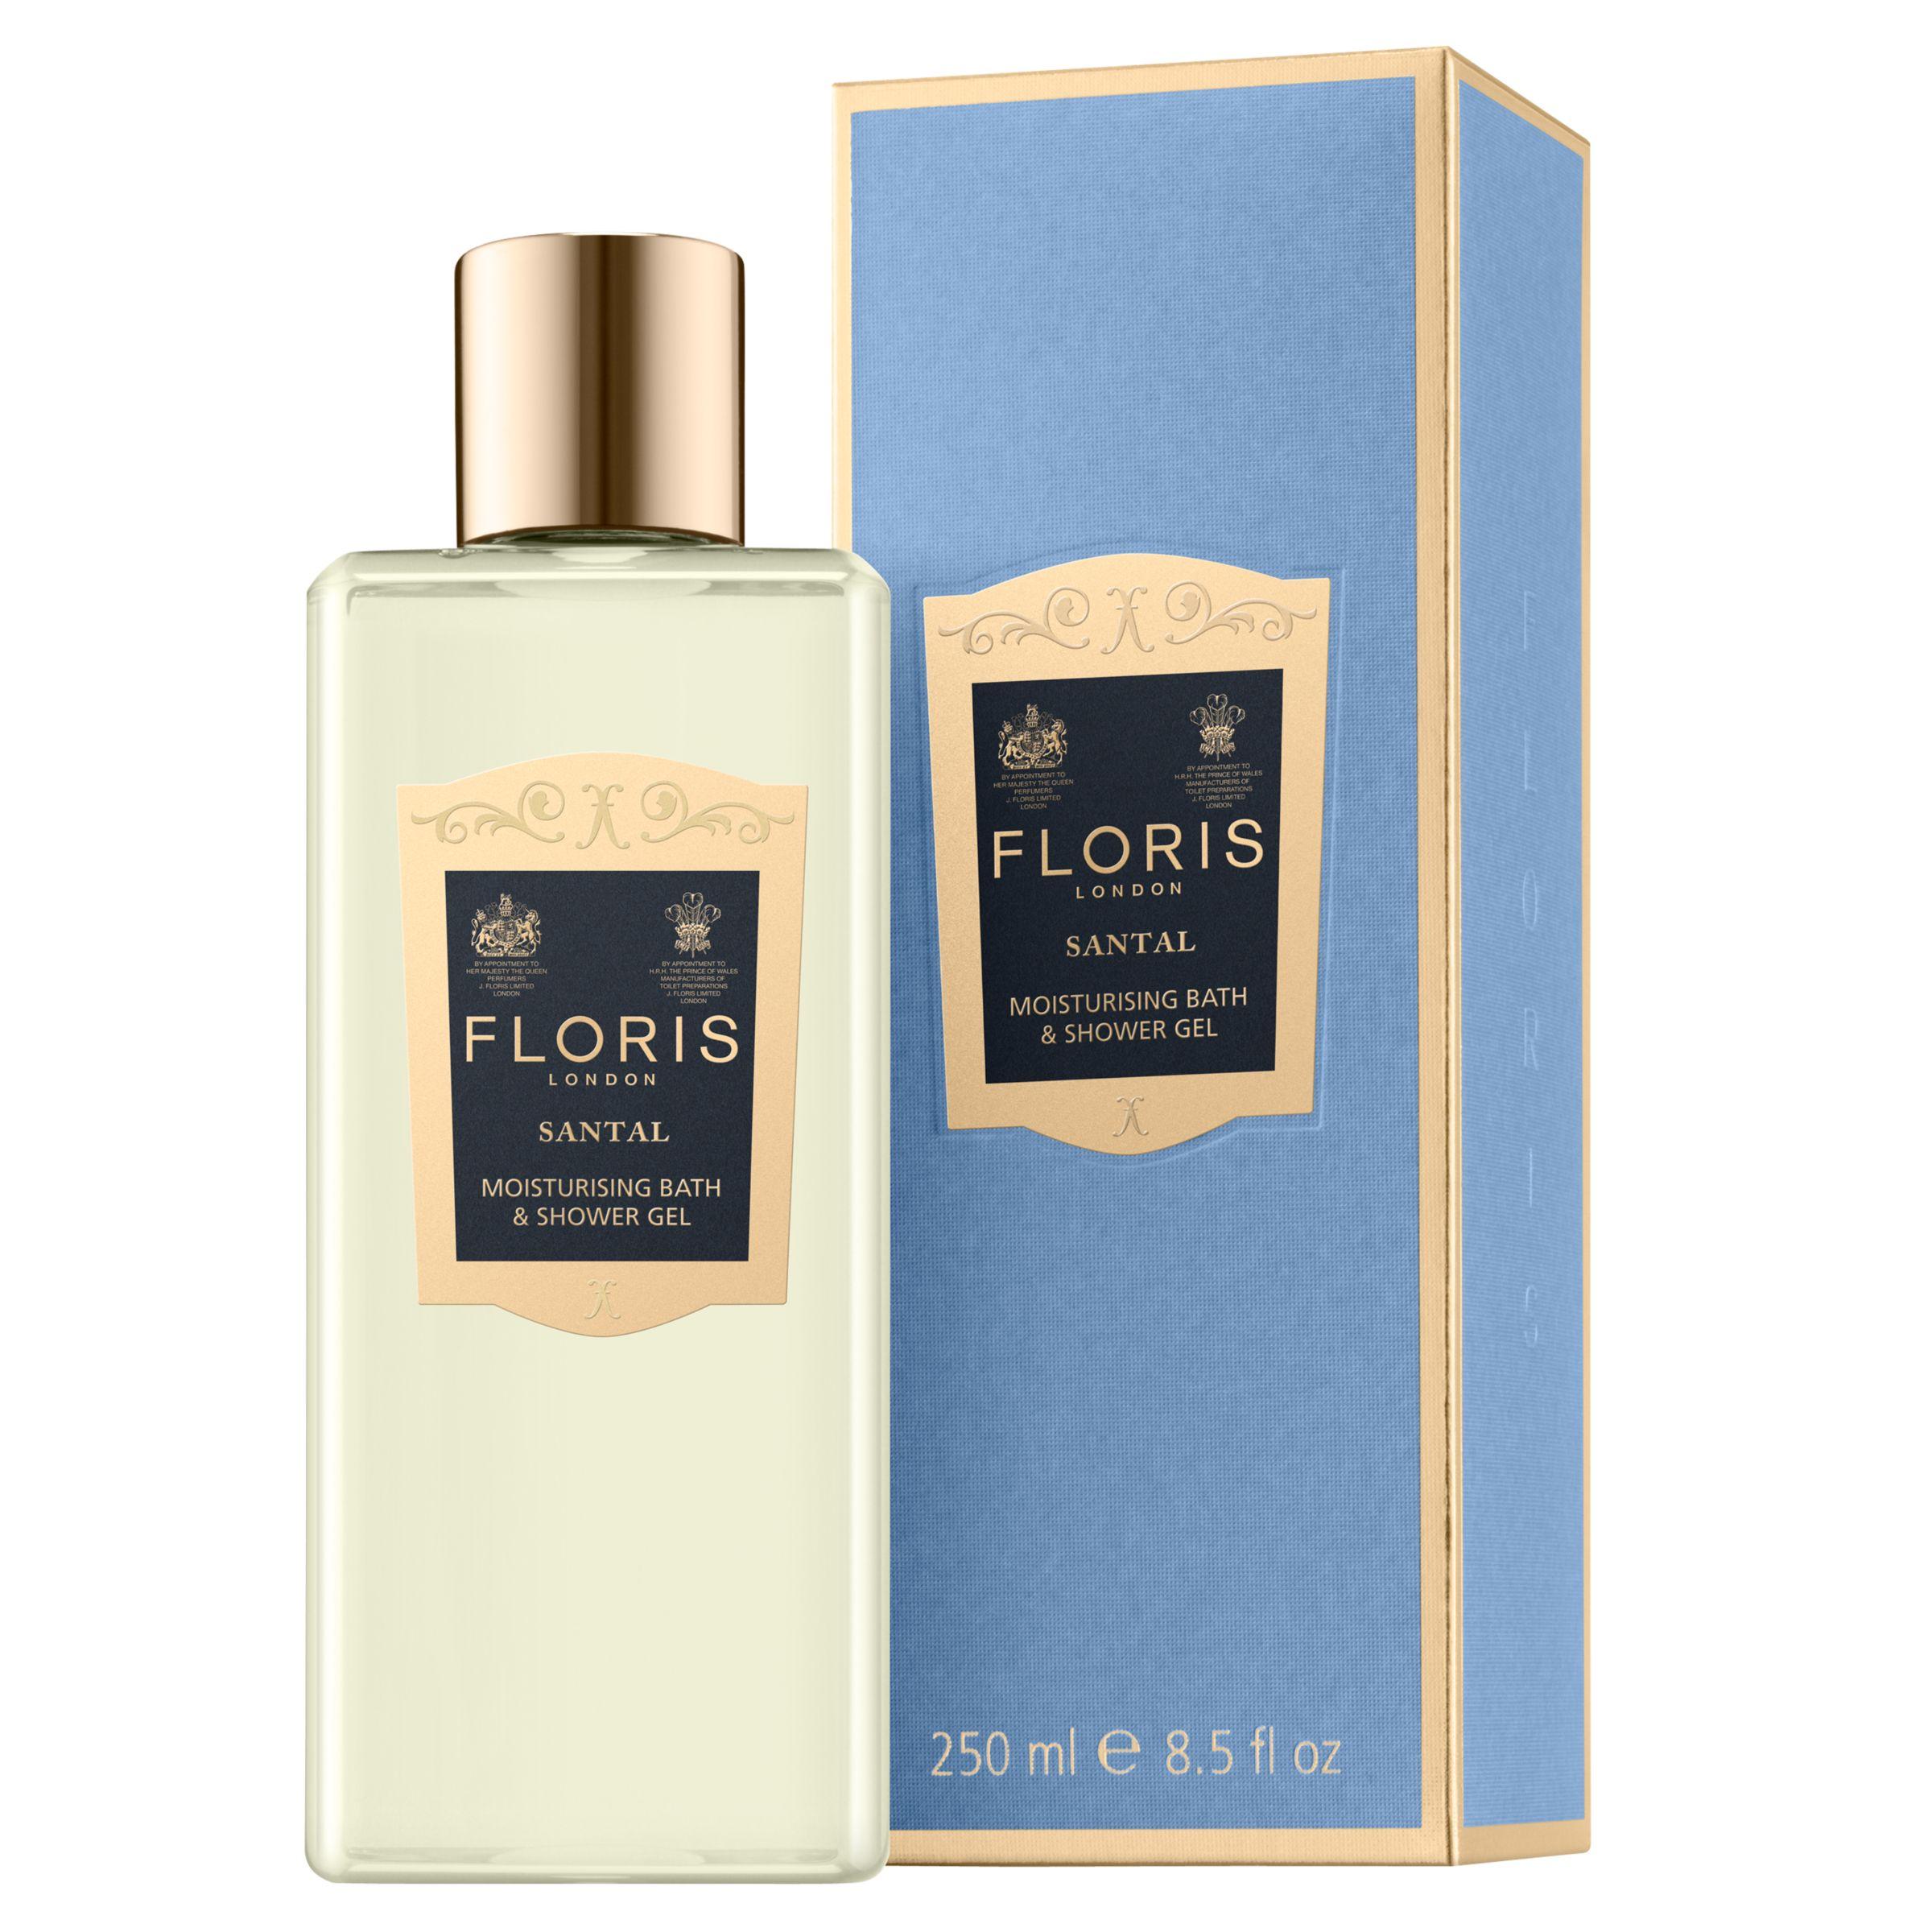 Floris Floris Santal Shower Gel, 250ml